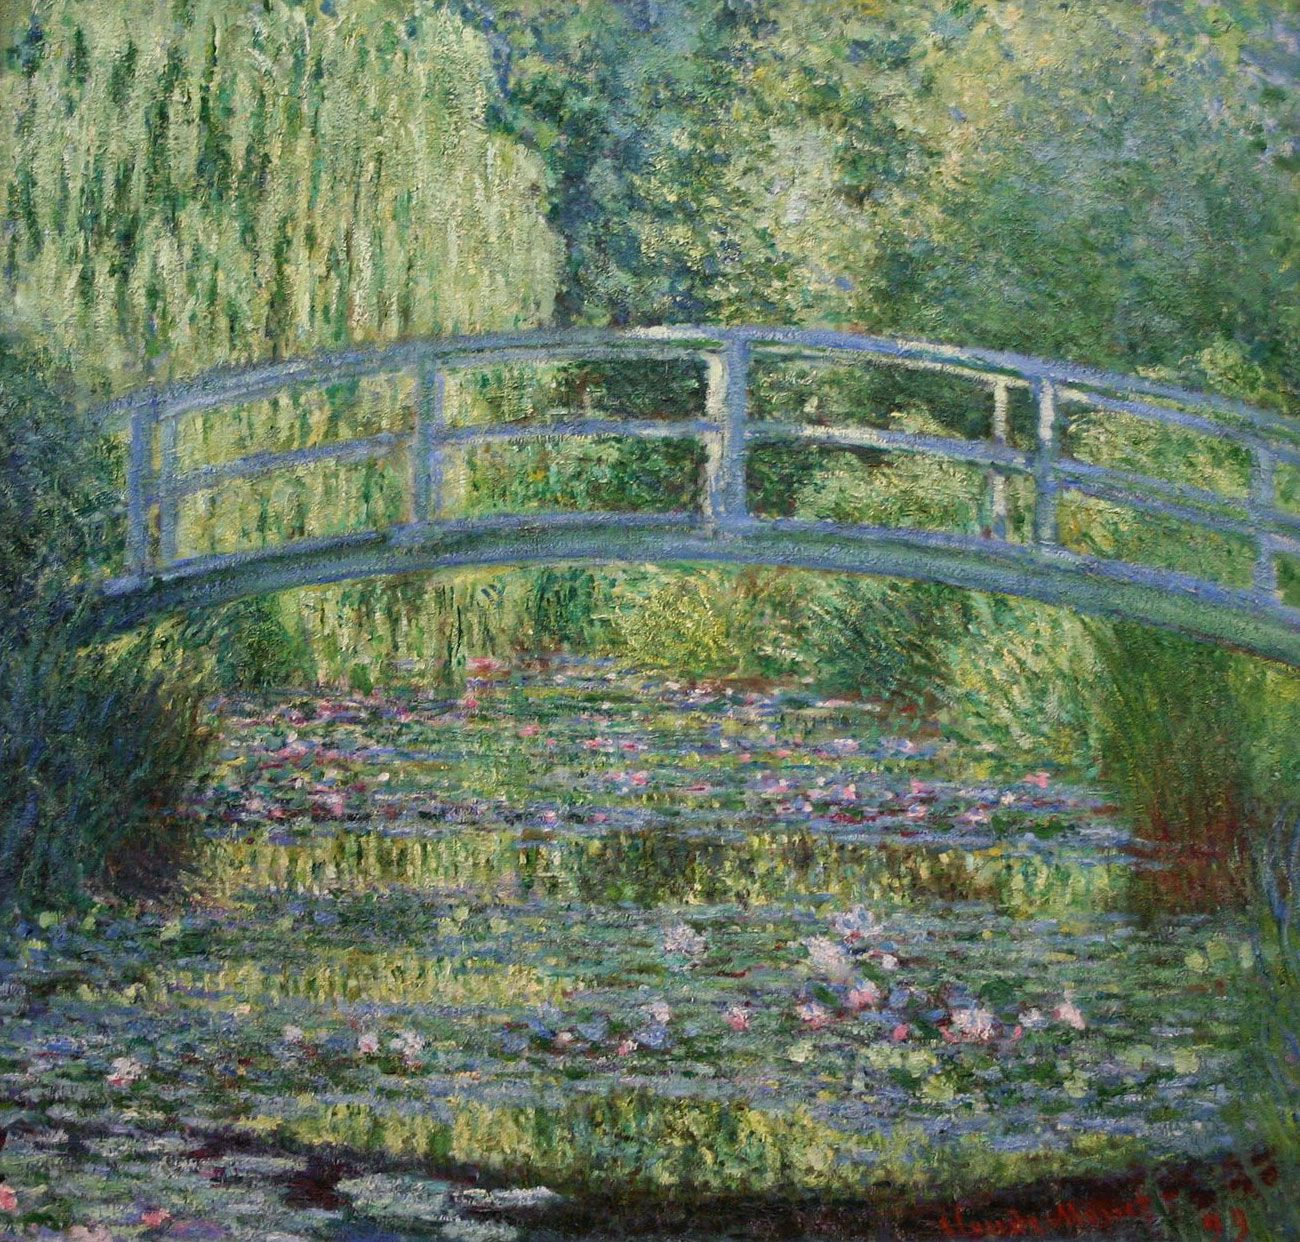 I Love The Works Of Claude Monet Aquarel Roos Impressionisme Parijs